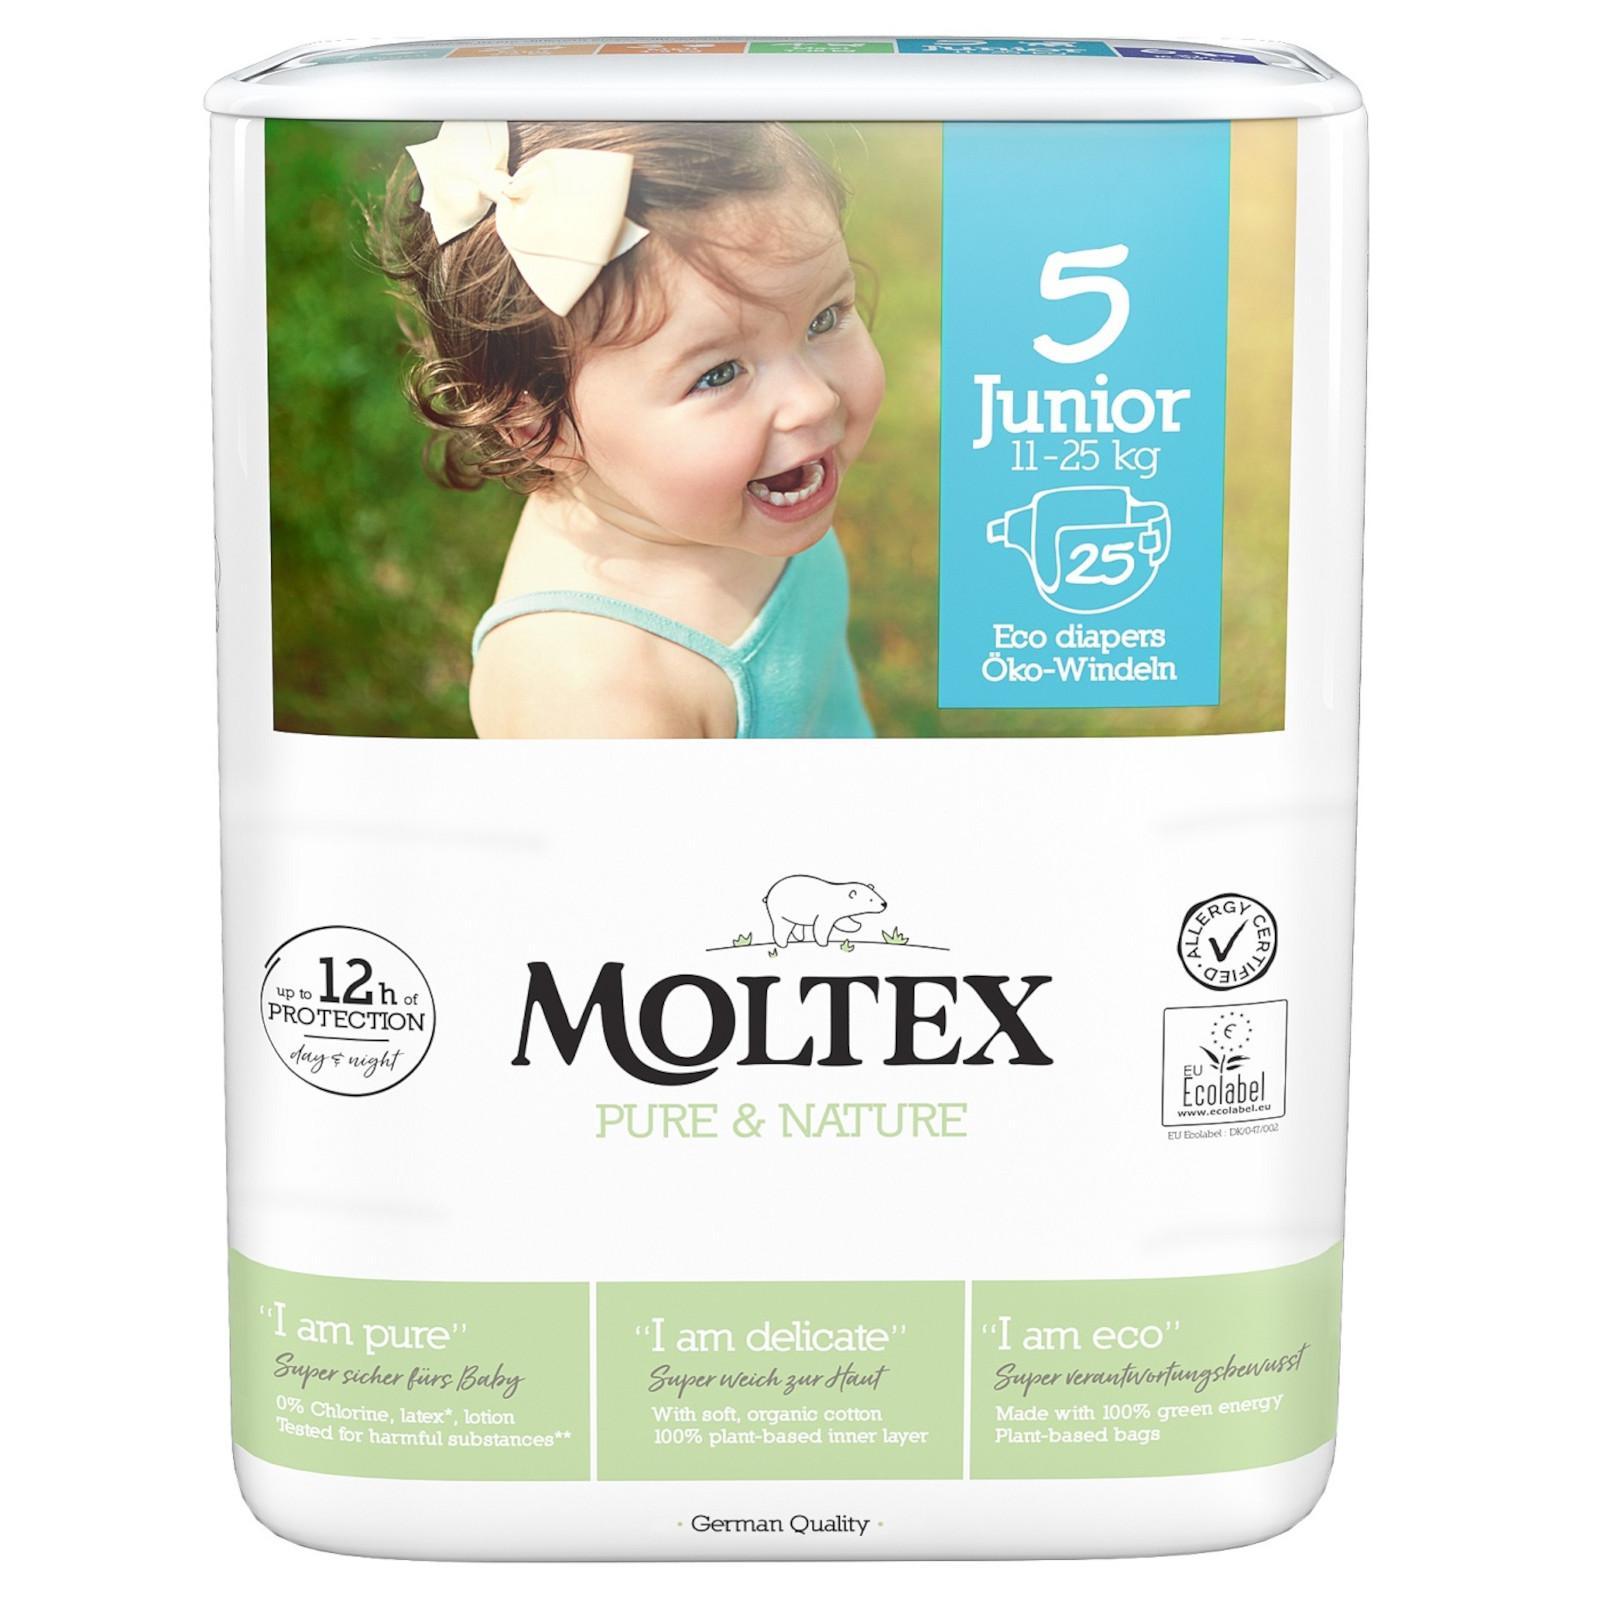 Moltex Dětské plenky Junior 11-25 kg Pure & Nature 25 ks